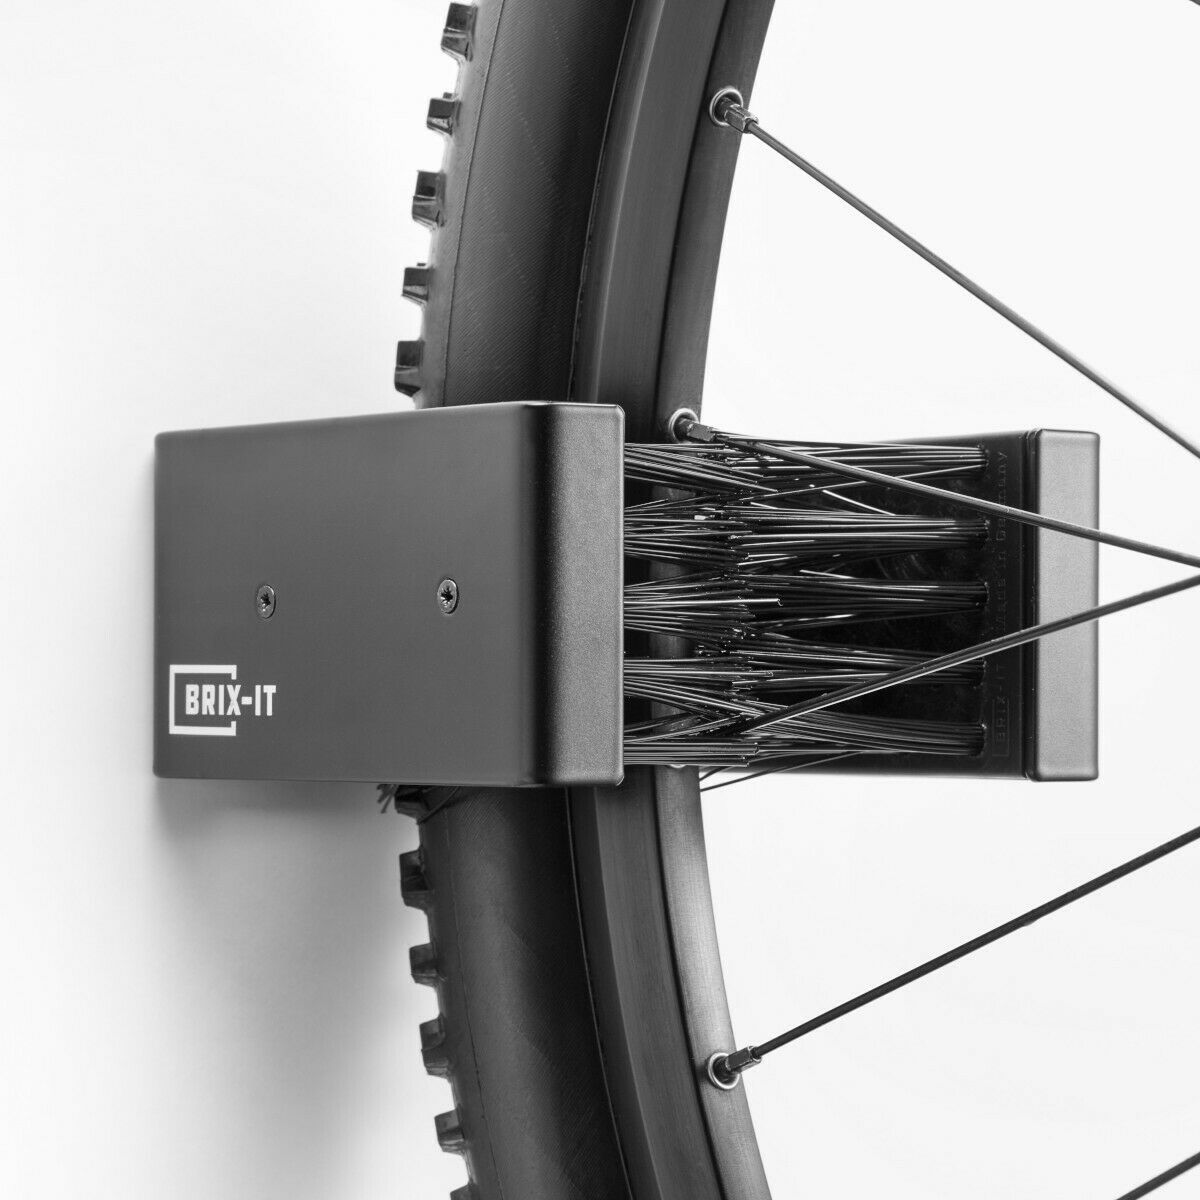 Brix-it Bicicleta Soporte Parot Universal para Neumático de 25mm hasta 65 Mm